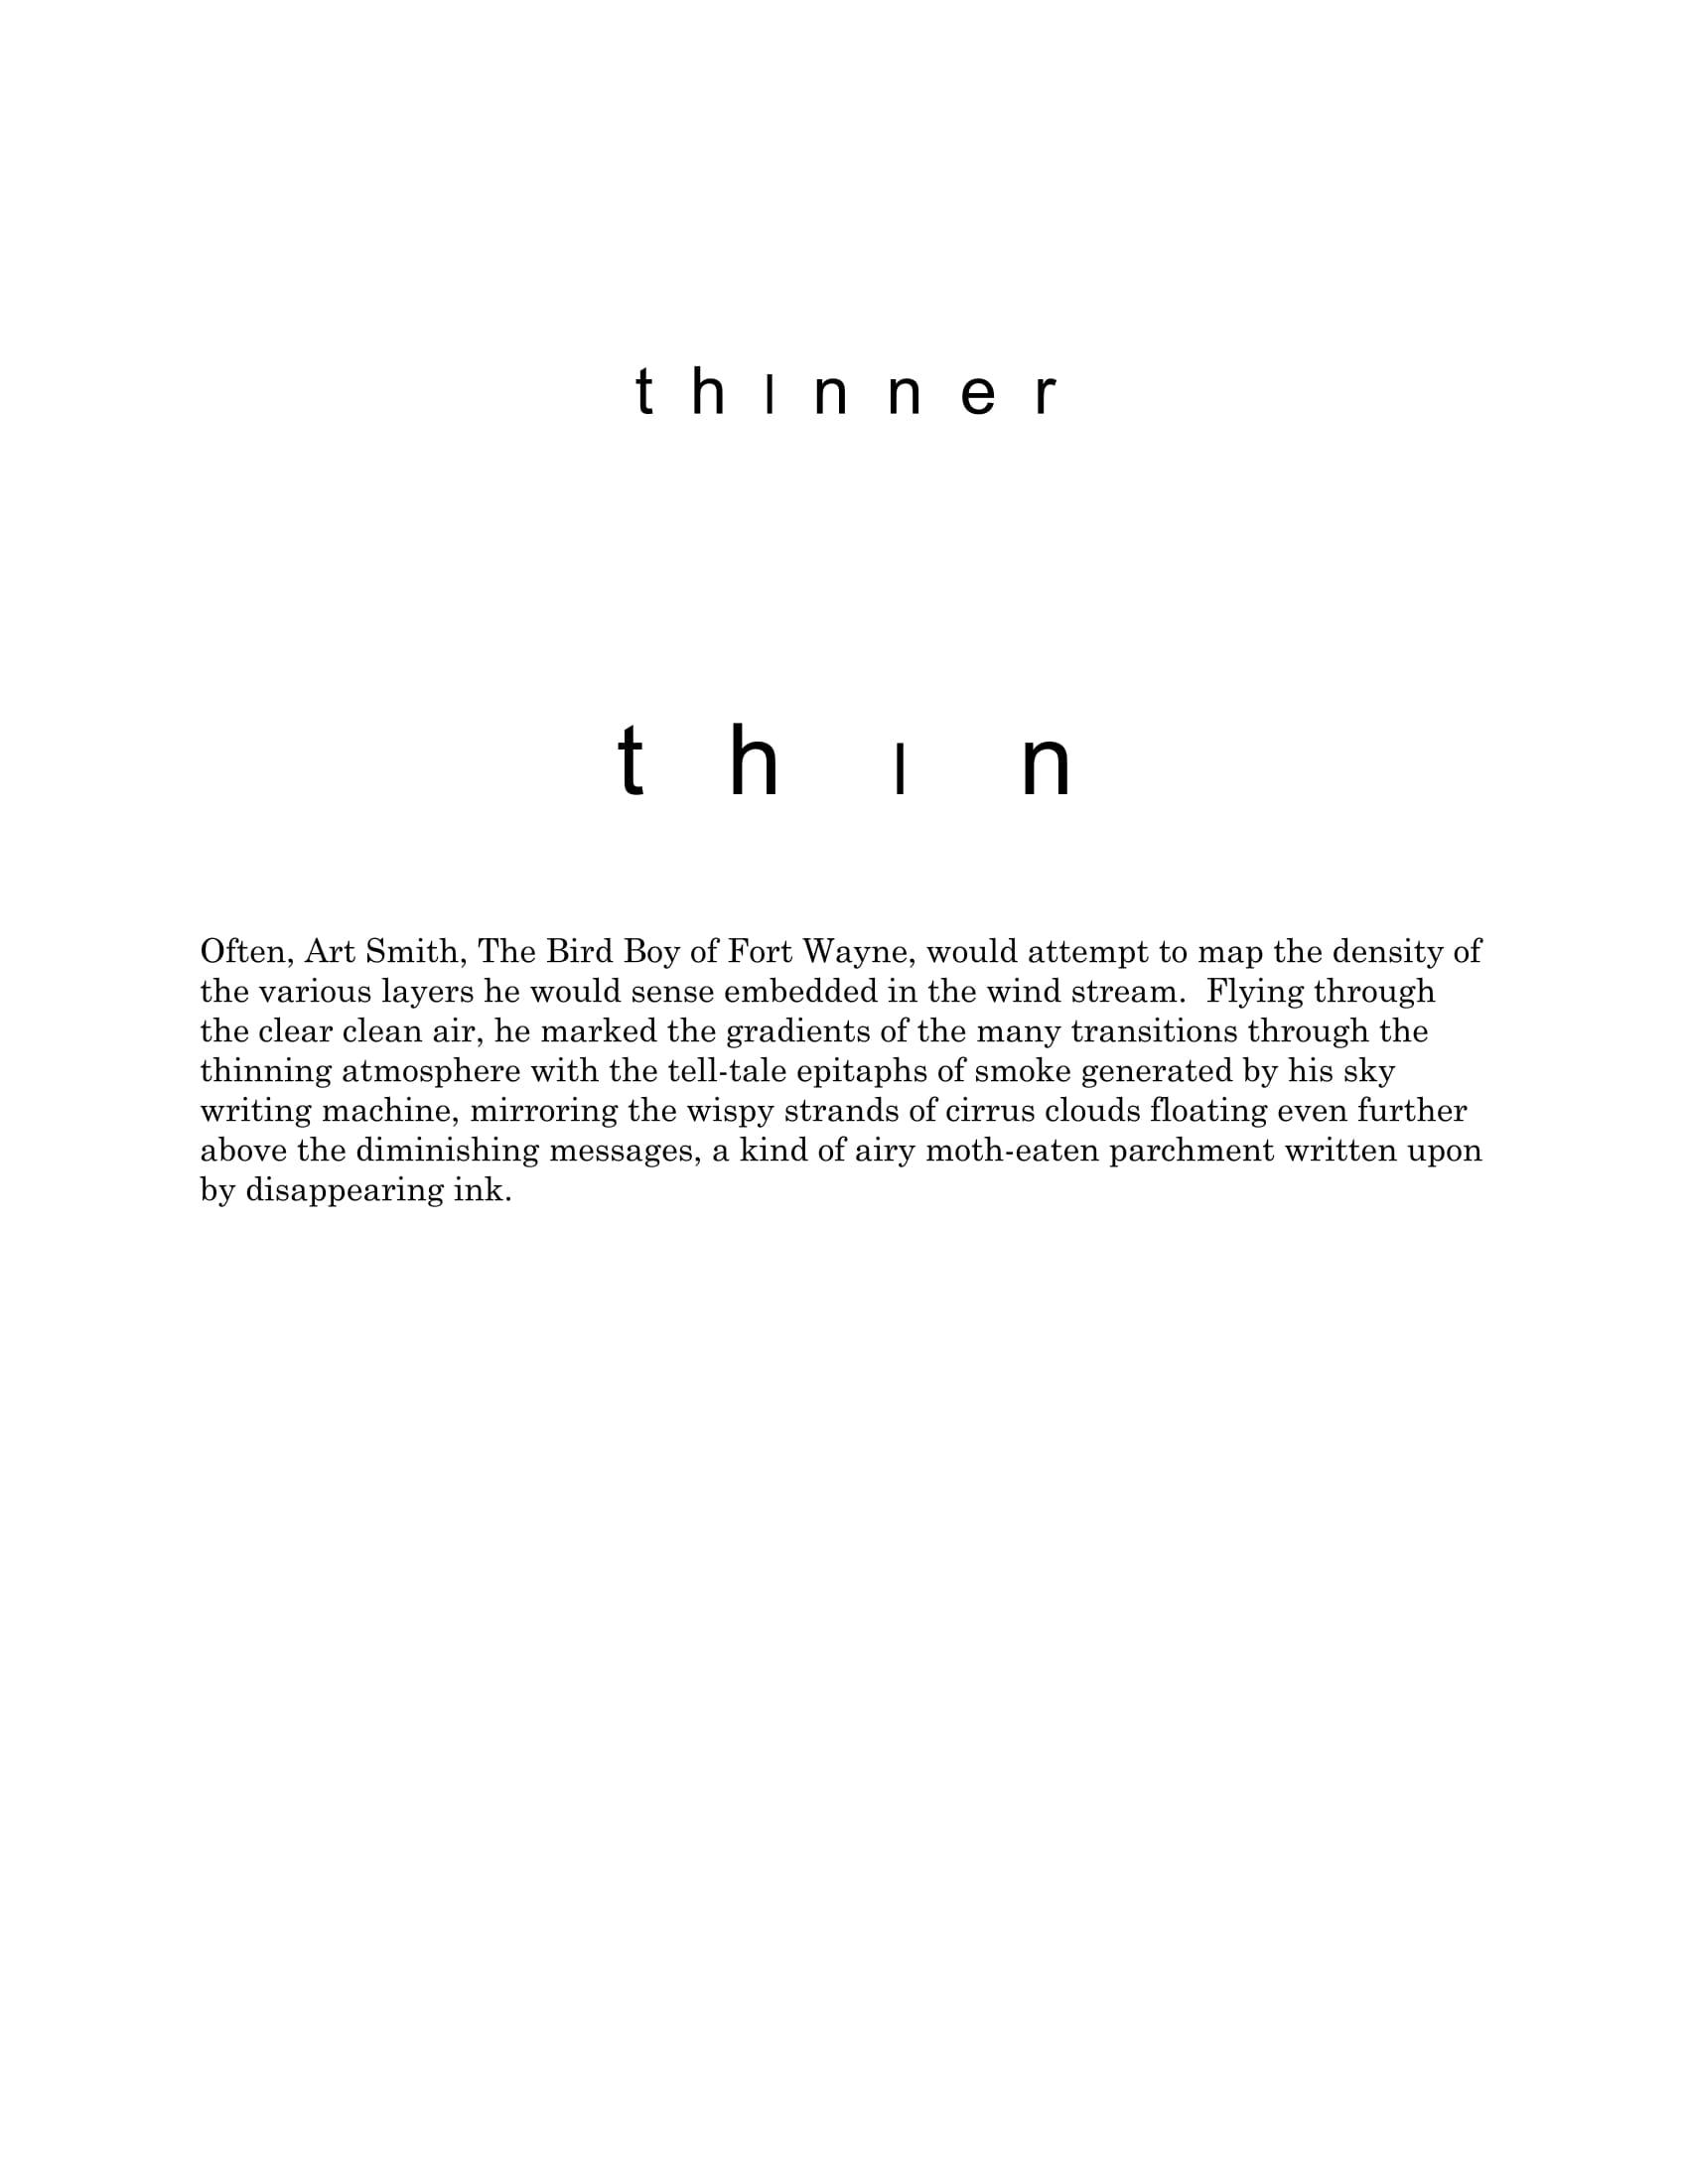 thin2-1.jpg